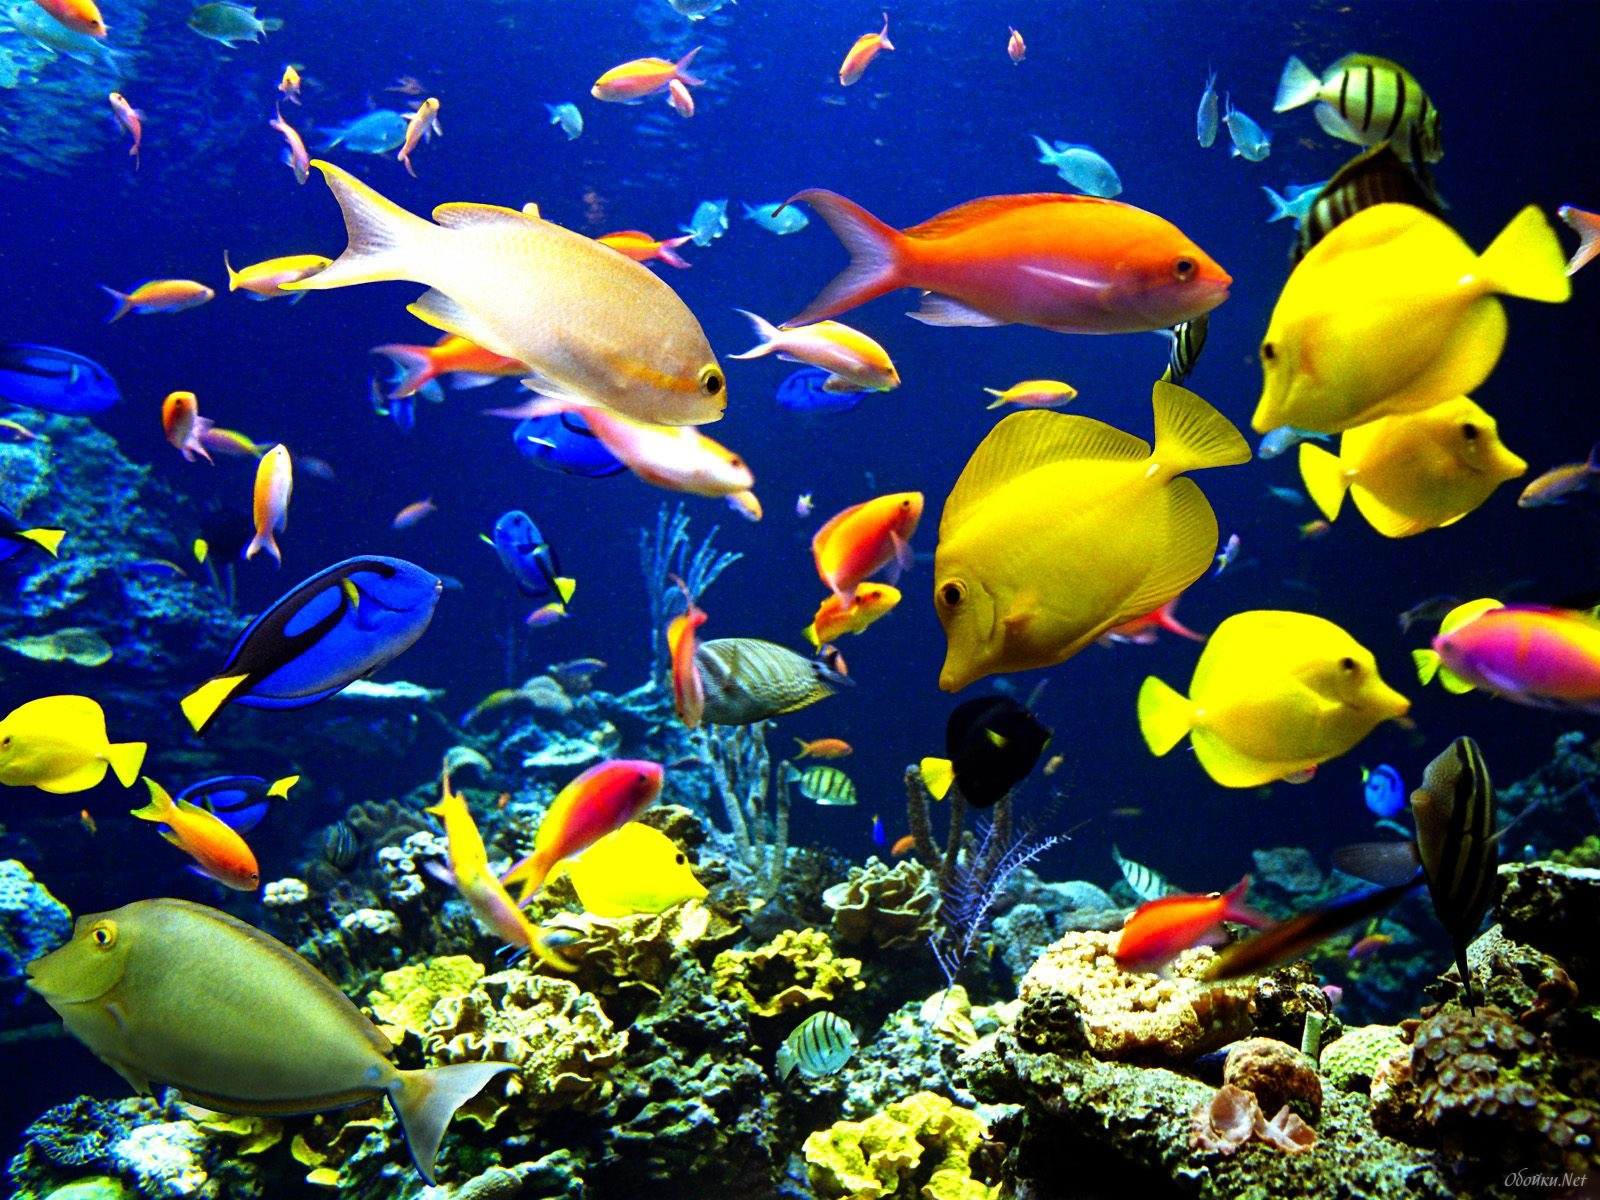 Fish aquarium screensaver - Free Fish Tank Screensavers And Wallpaper Photos Of Fish Tank